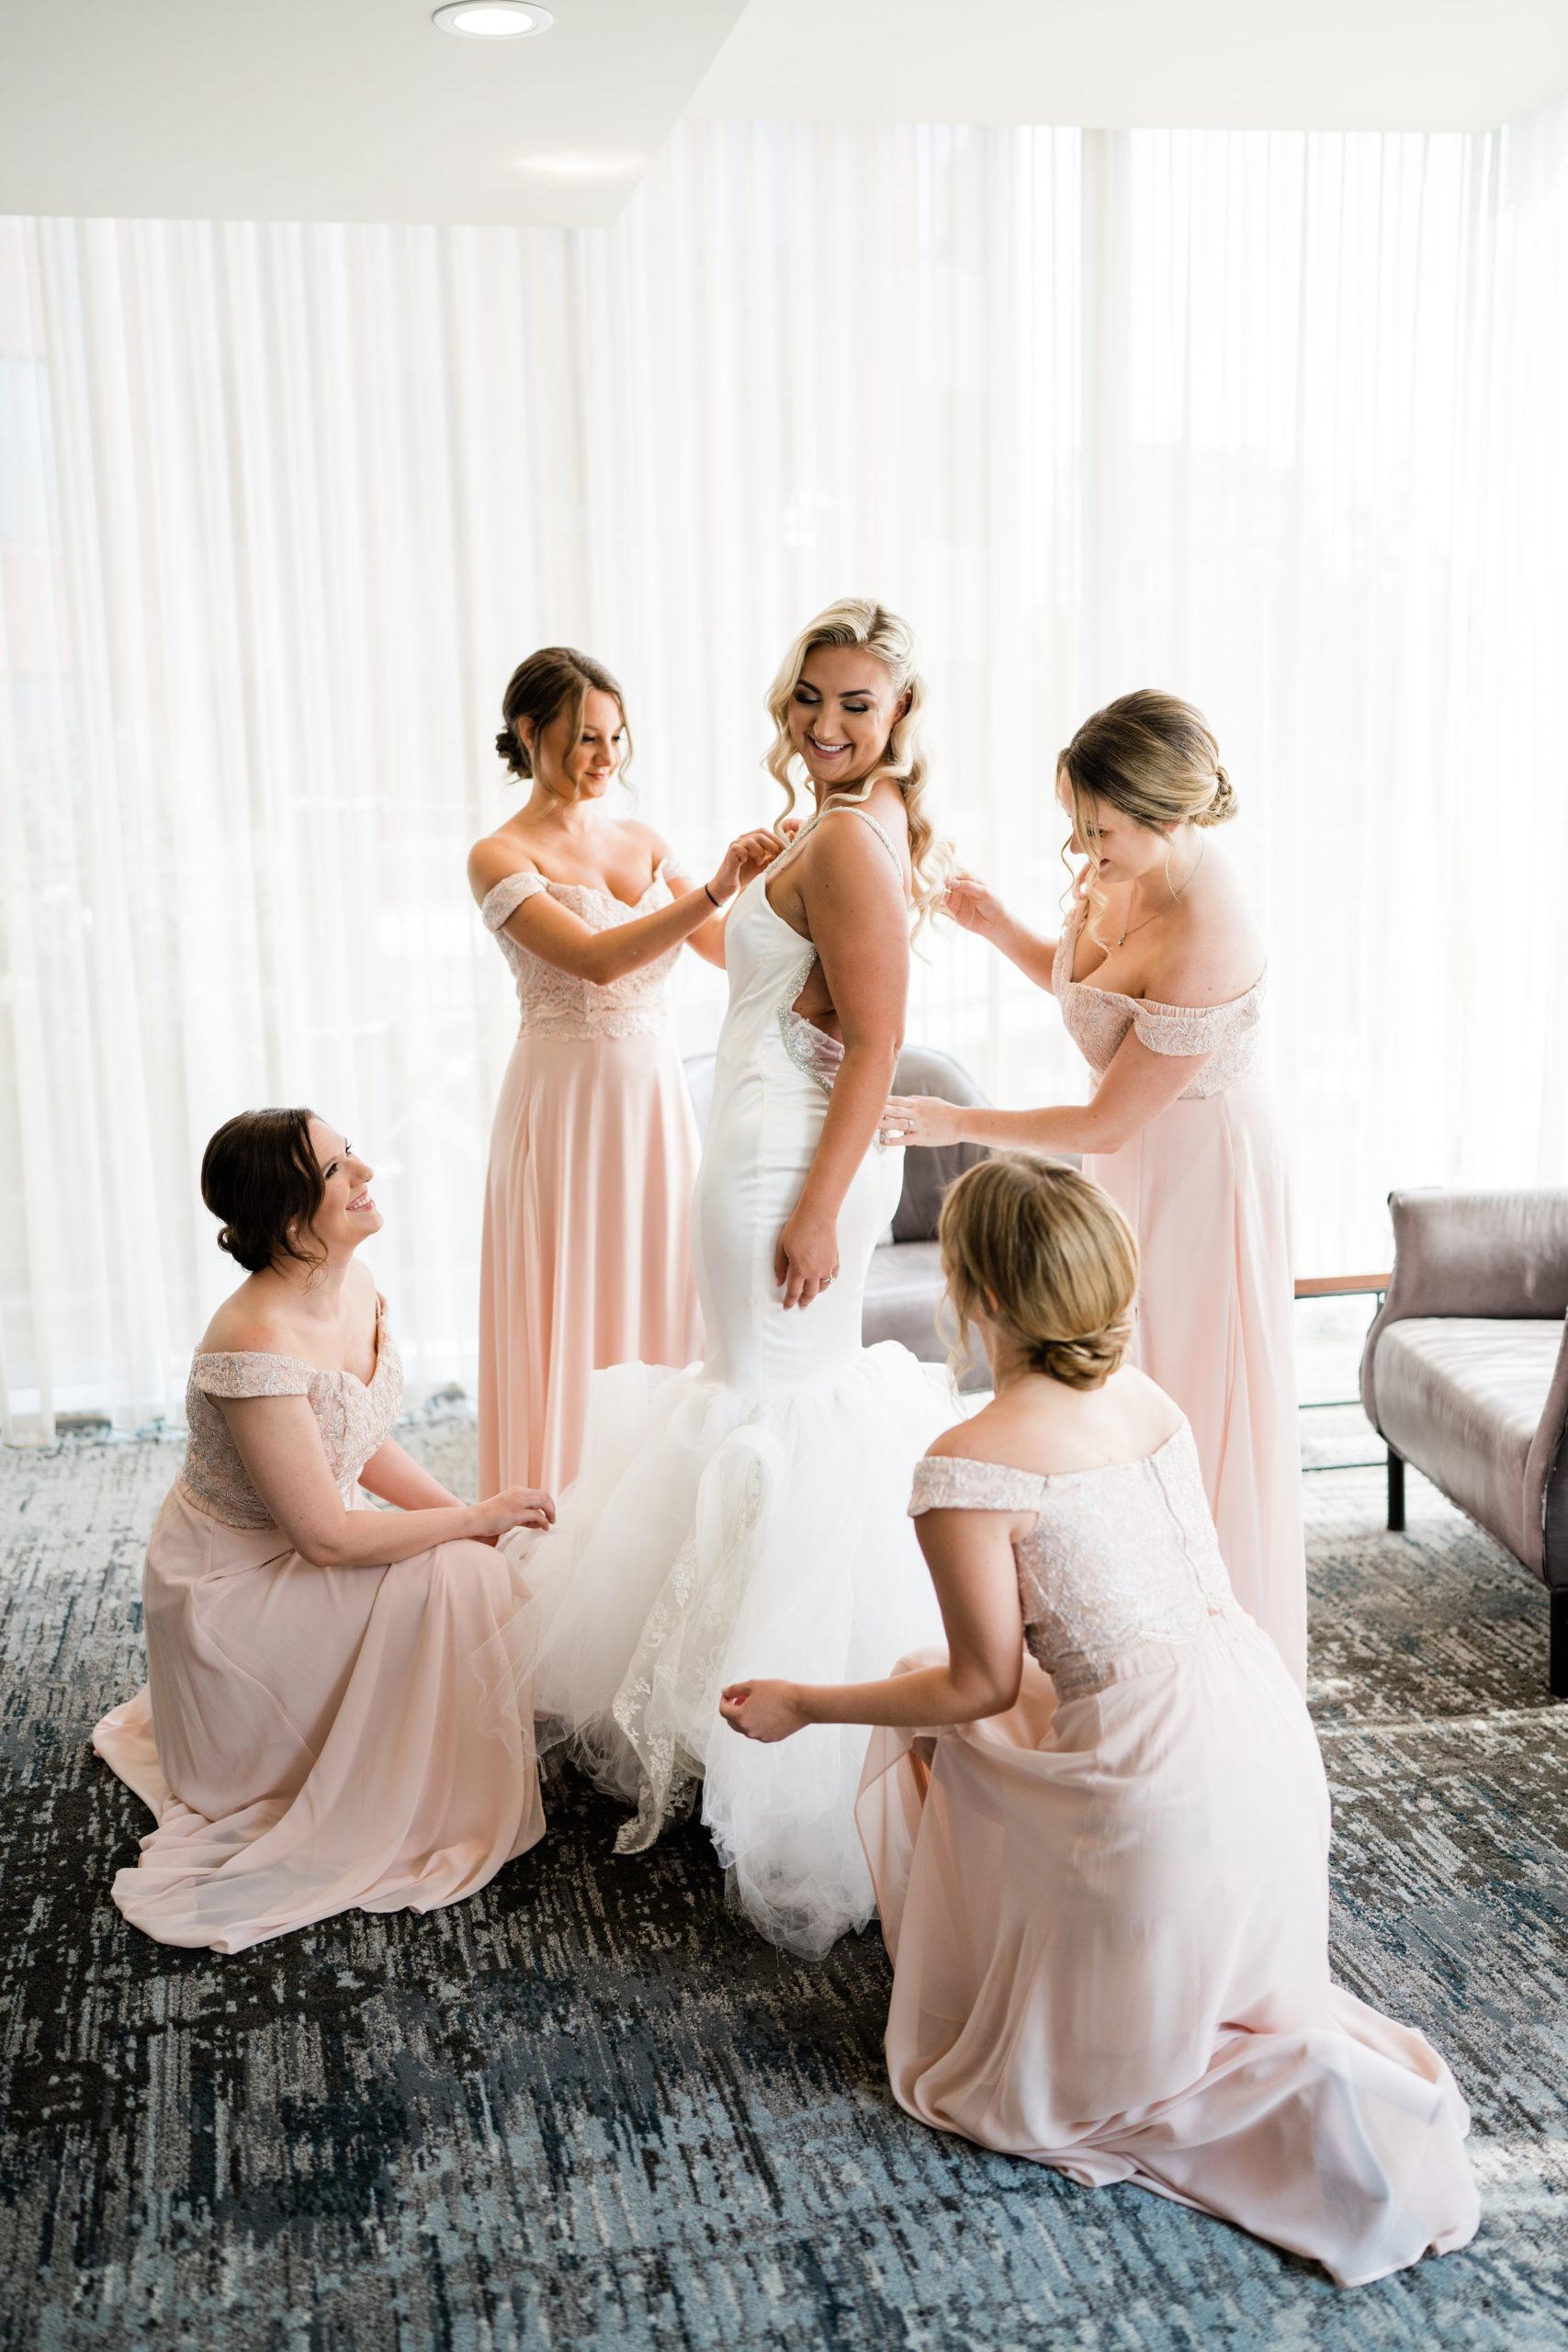 Bridesmaids help bride into her wedding dress before ceremony on MV Skanson